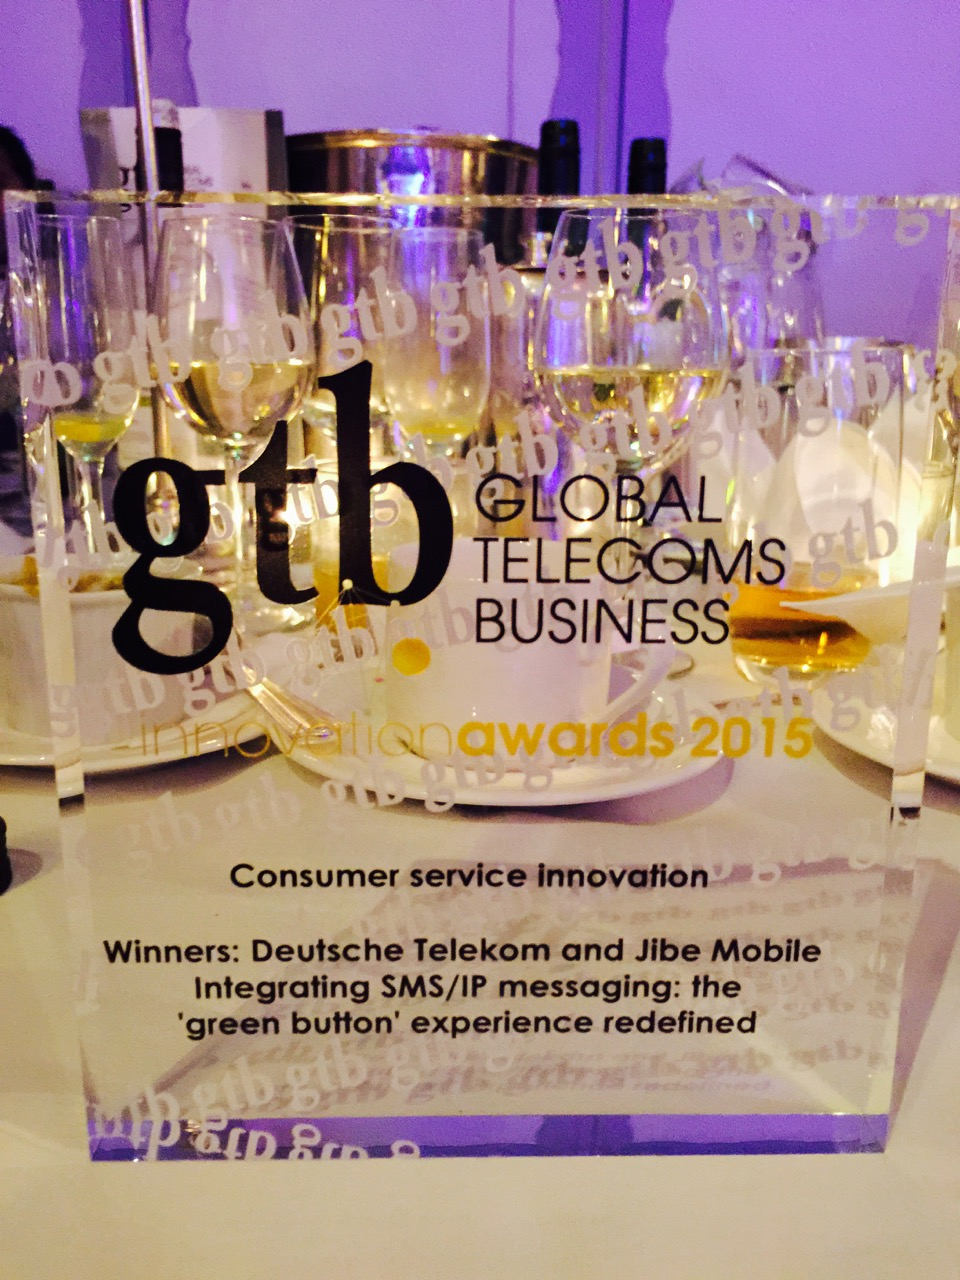 Gsma Winners Deutsche Telekom And Jibe Mobile Accept Prestigious Global Telecoms Business Innovation Award Future Networks